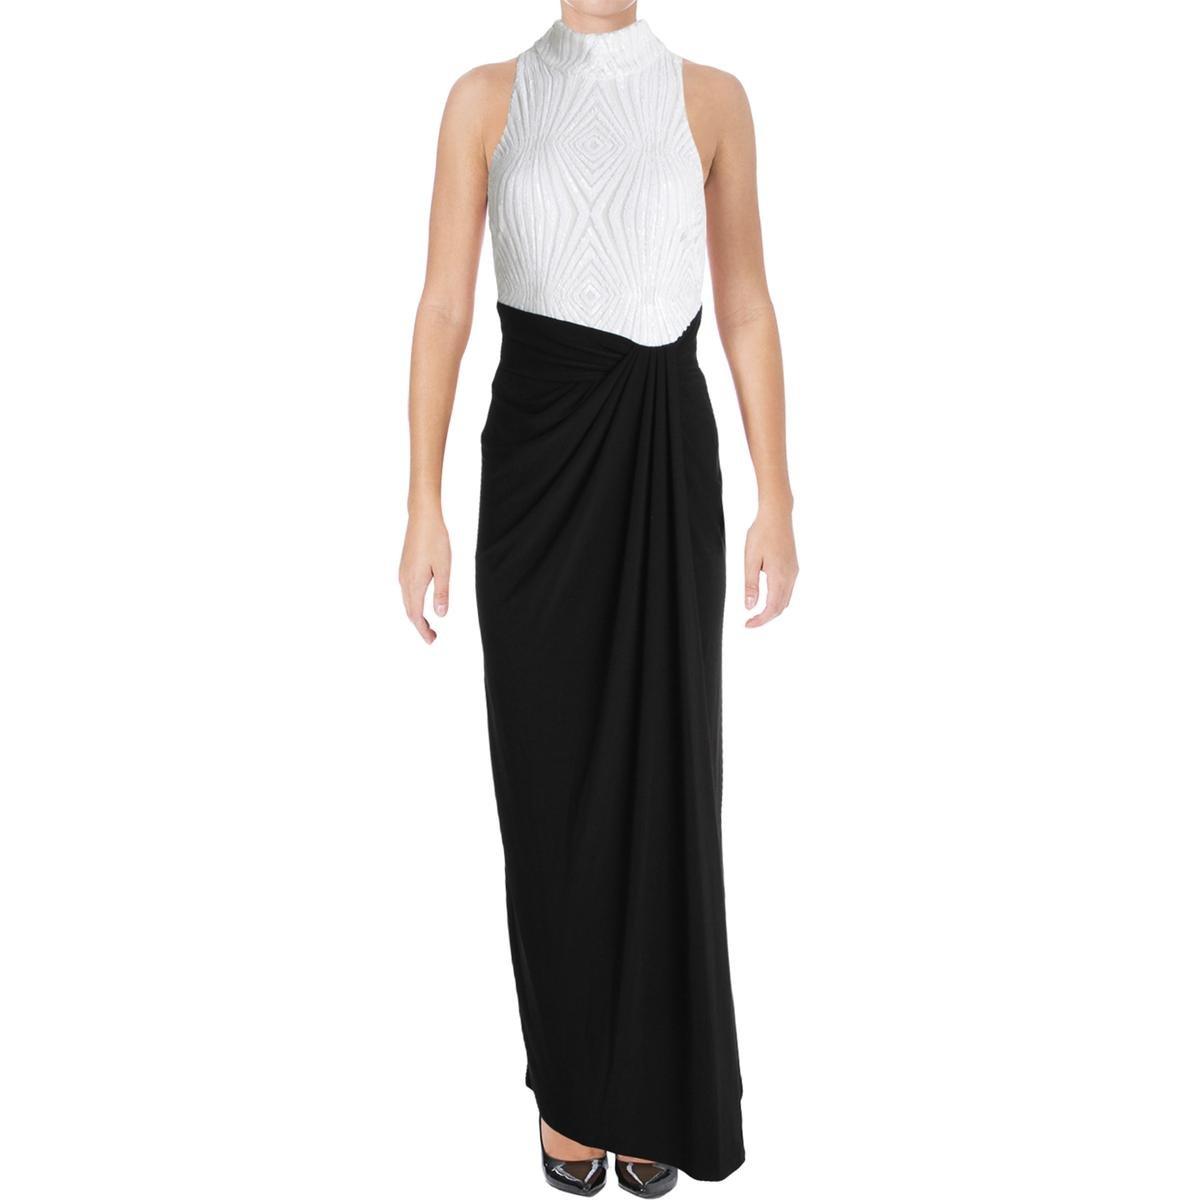 Ralph Lauren Womens Sequined Gown Dress Blwhtsh 2